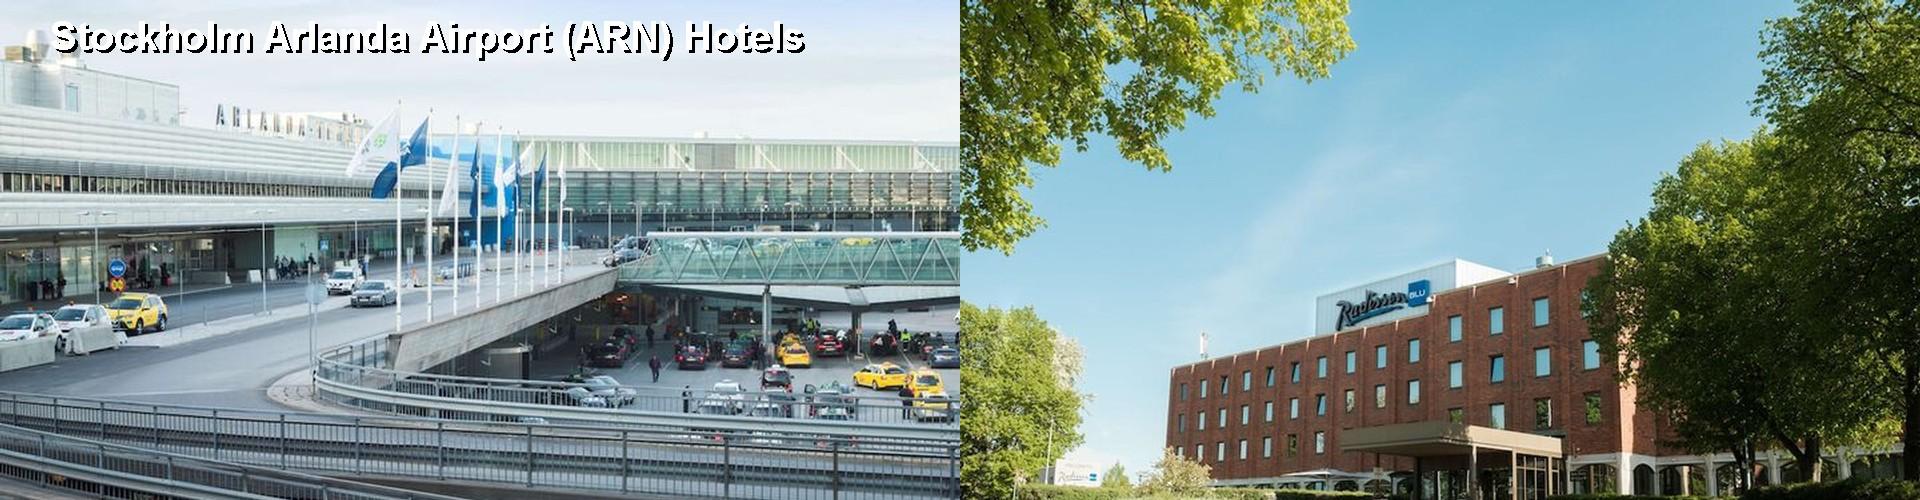 hotels near stockholm arlanda airport arn